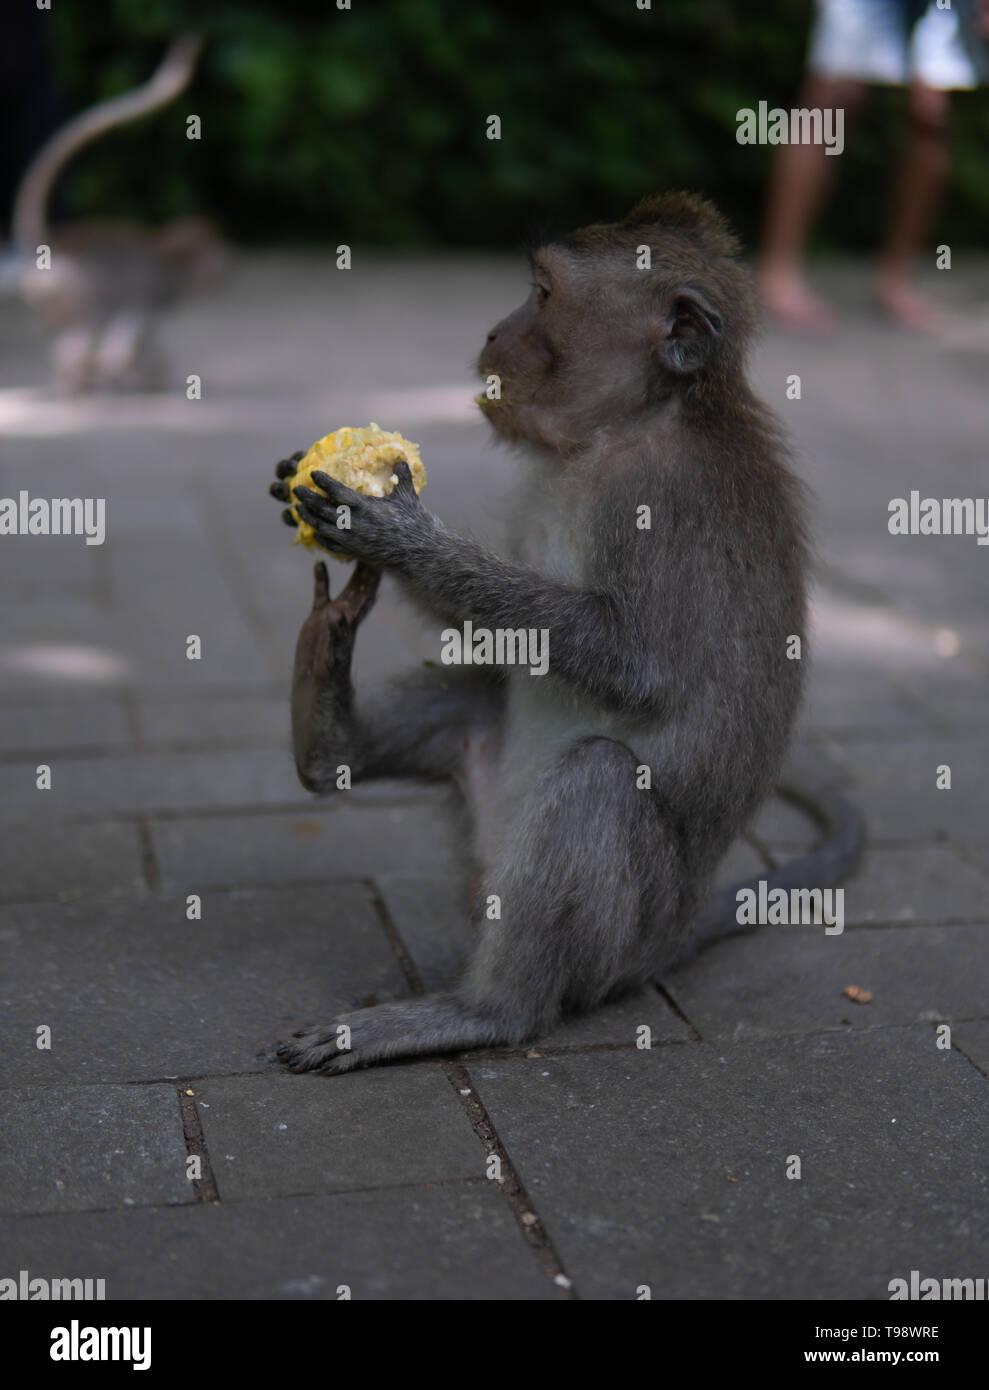 Young Money sitting on ground eating corn in Monkey Forrest, Ubud, Bali, Indonesia. - Stock Image